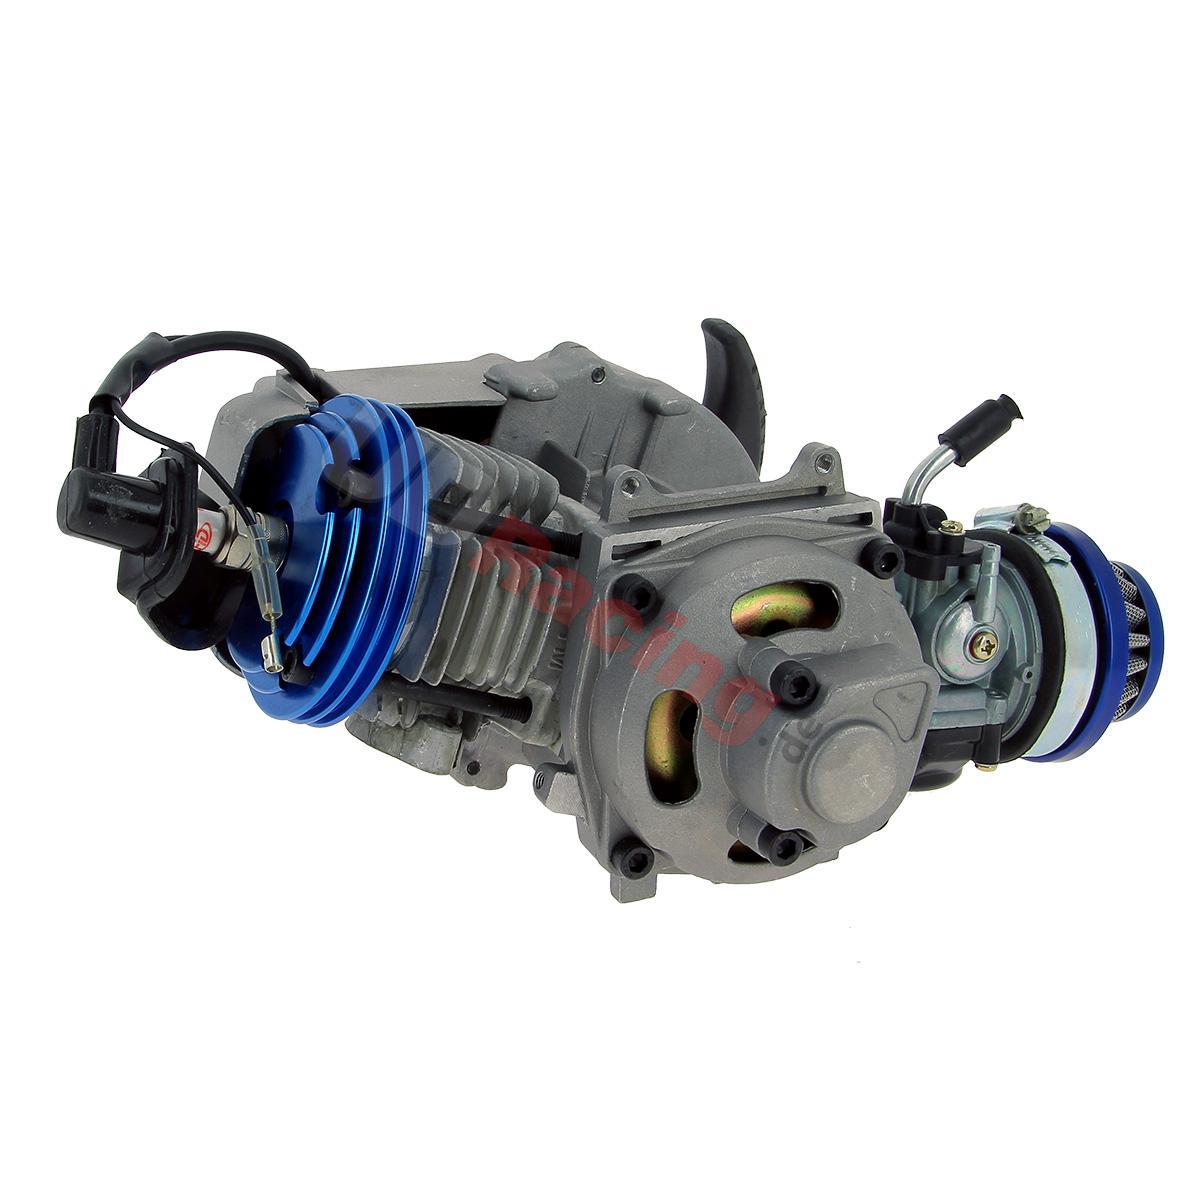 Kit UD Racing, blau, für Pocket Quad (typ 2), Motoren, Pocket Quad ...